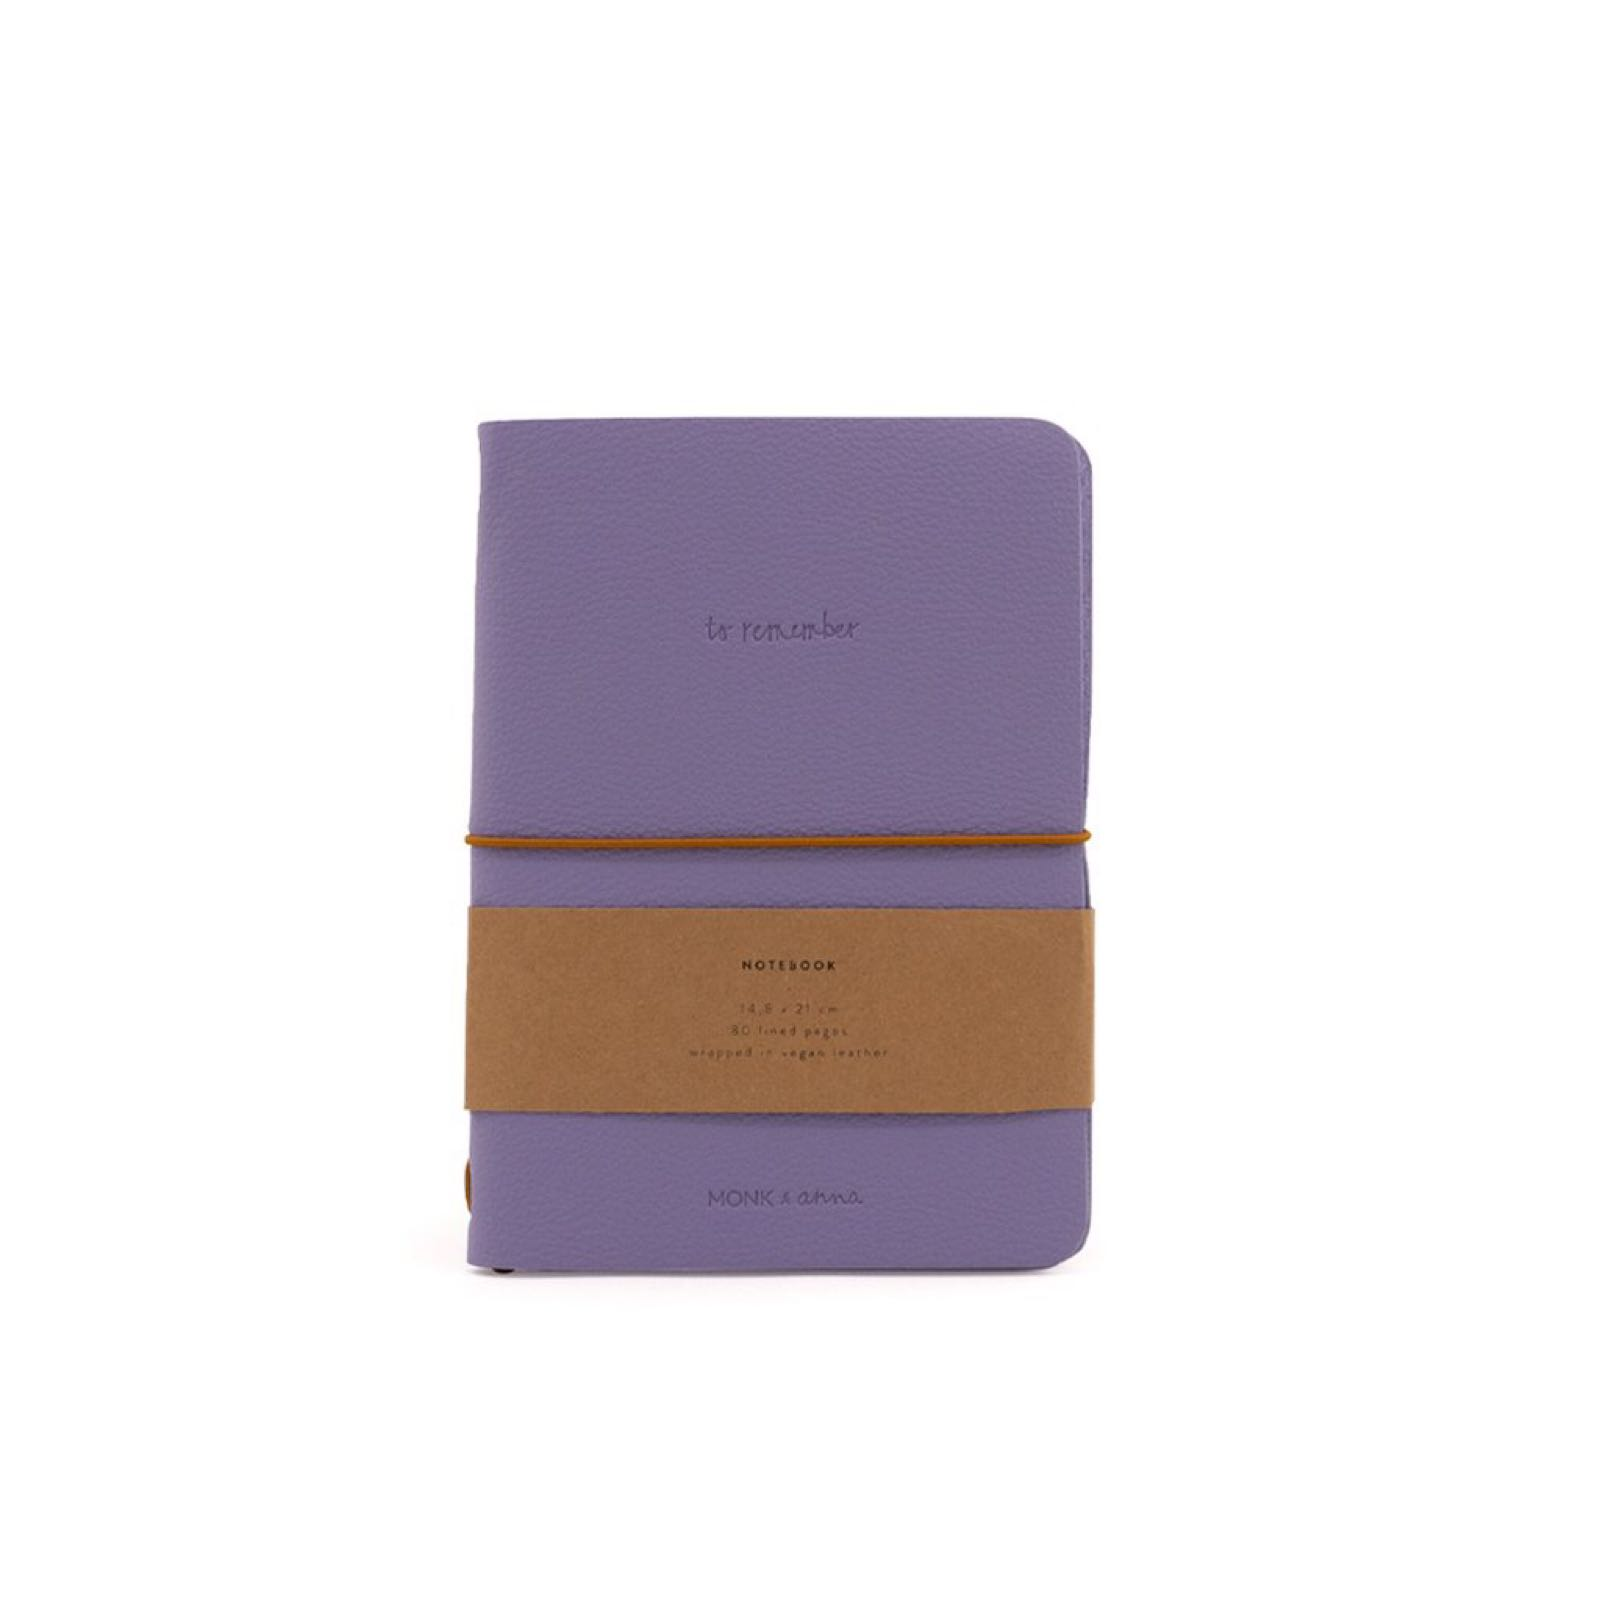 Monk & Anna Notebook - Lilac